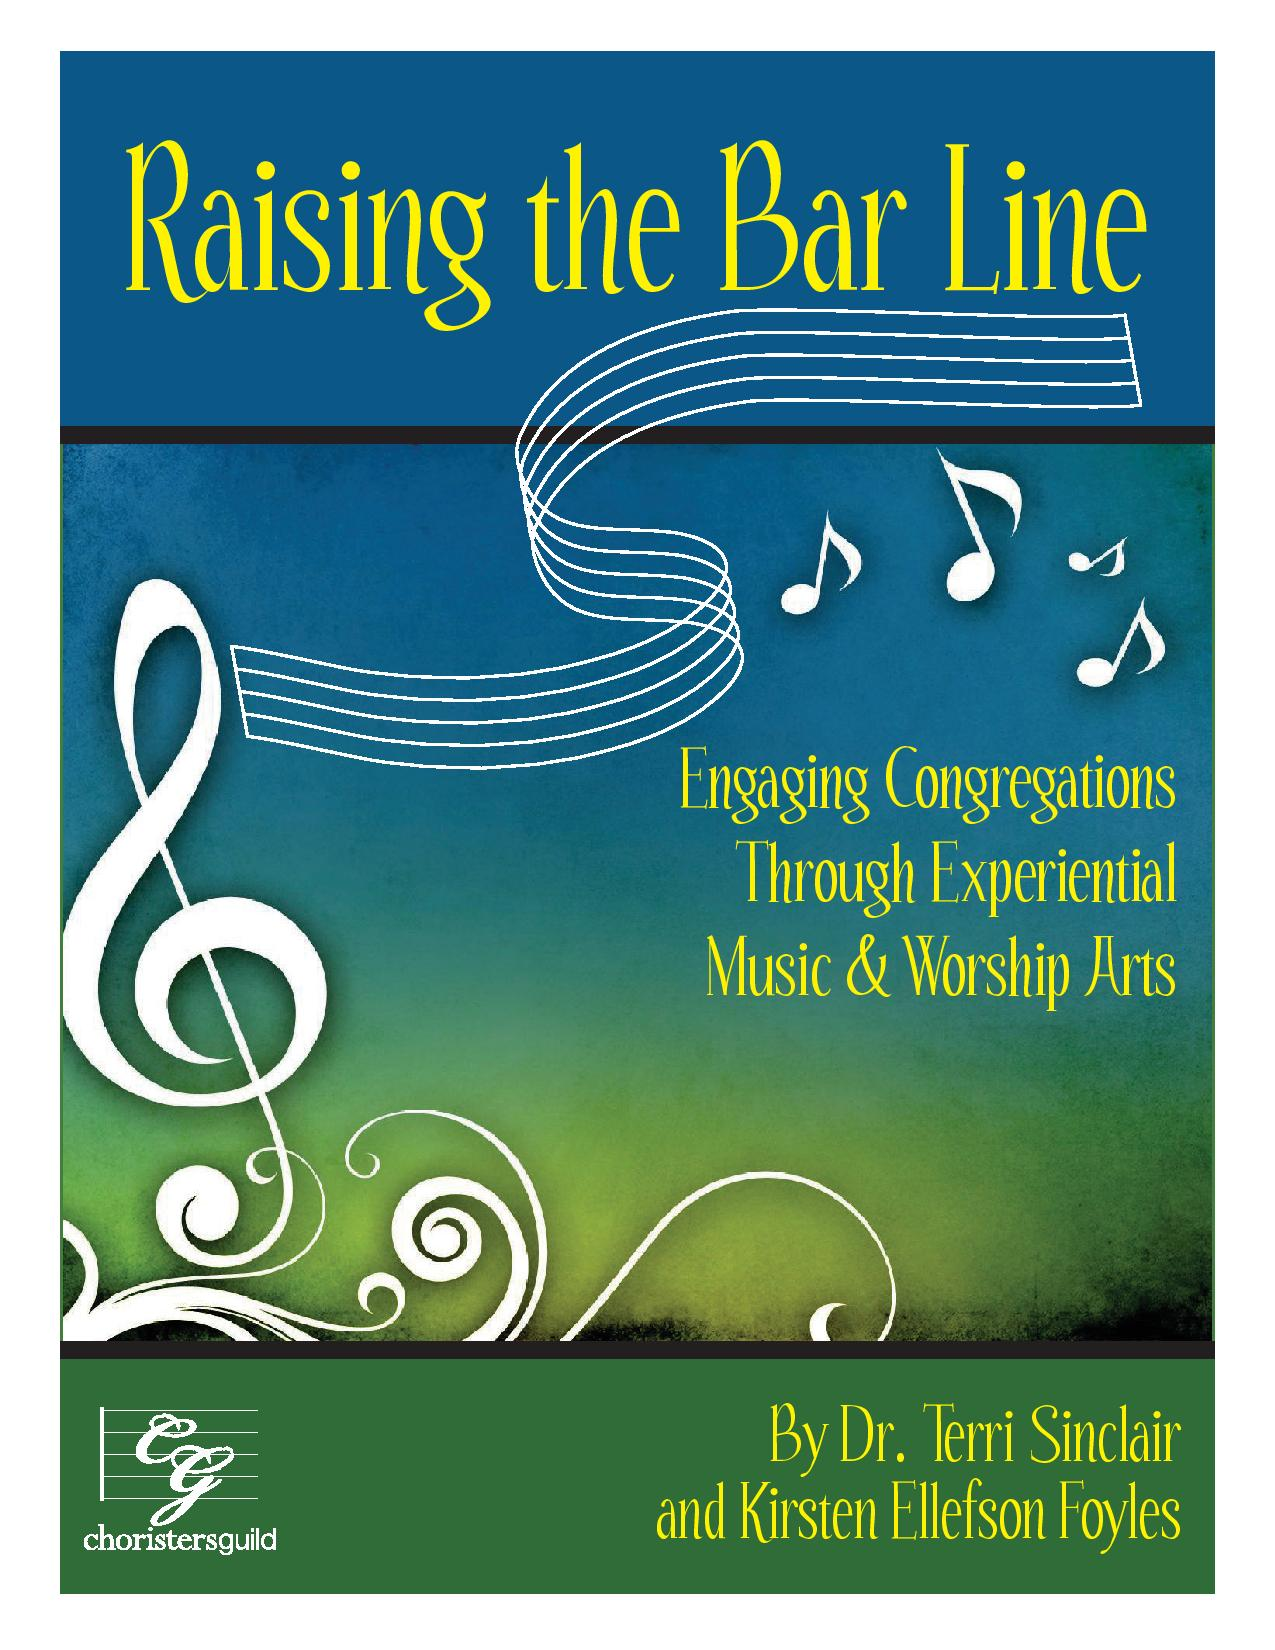 Raising the Bar Line